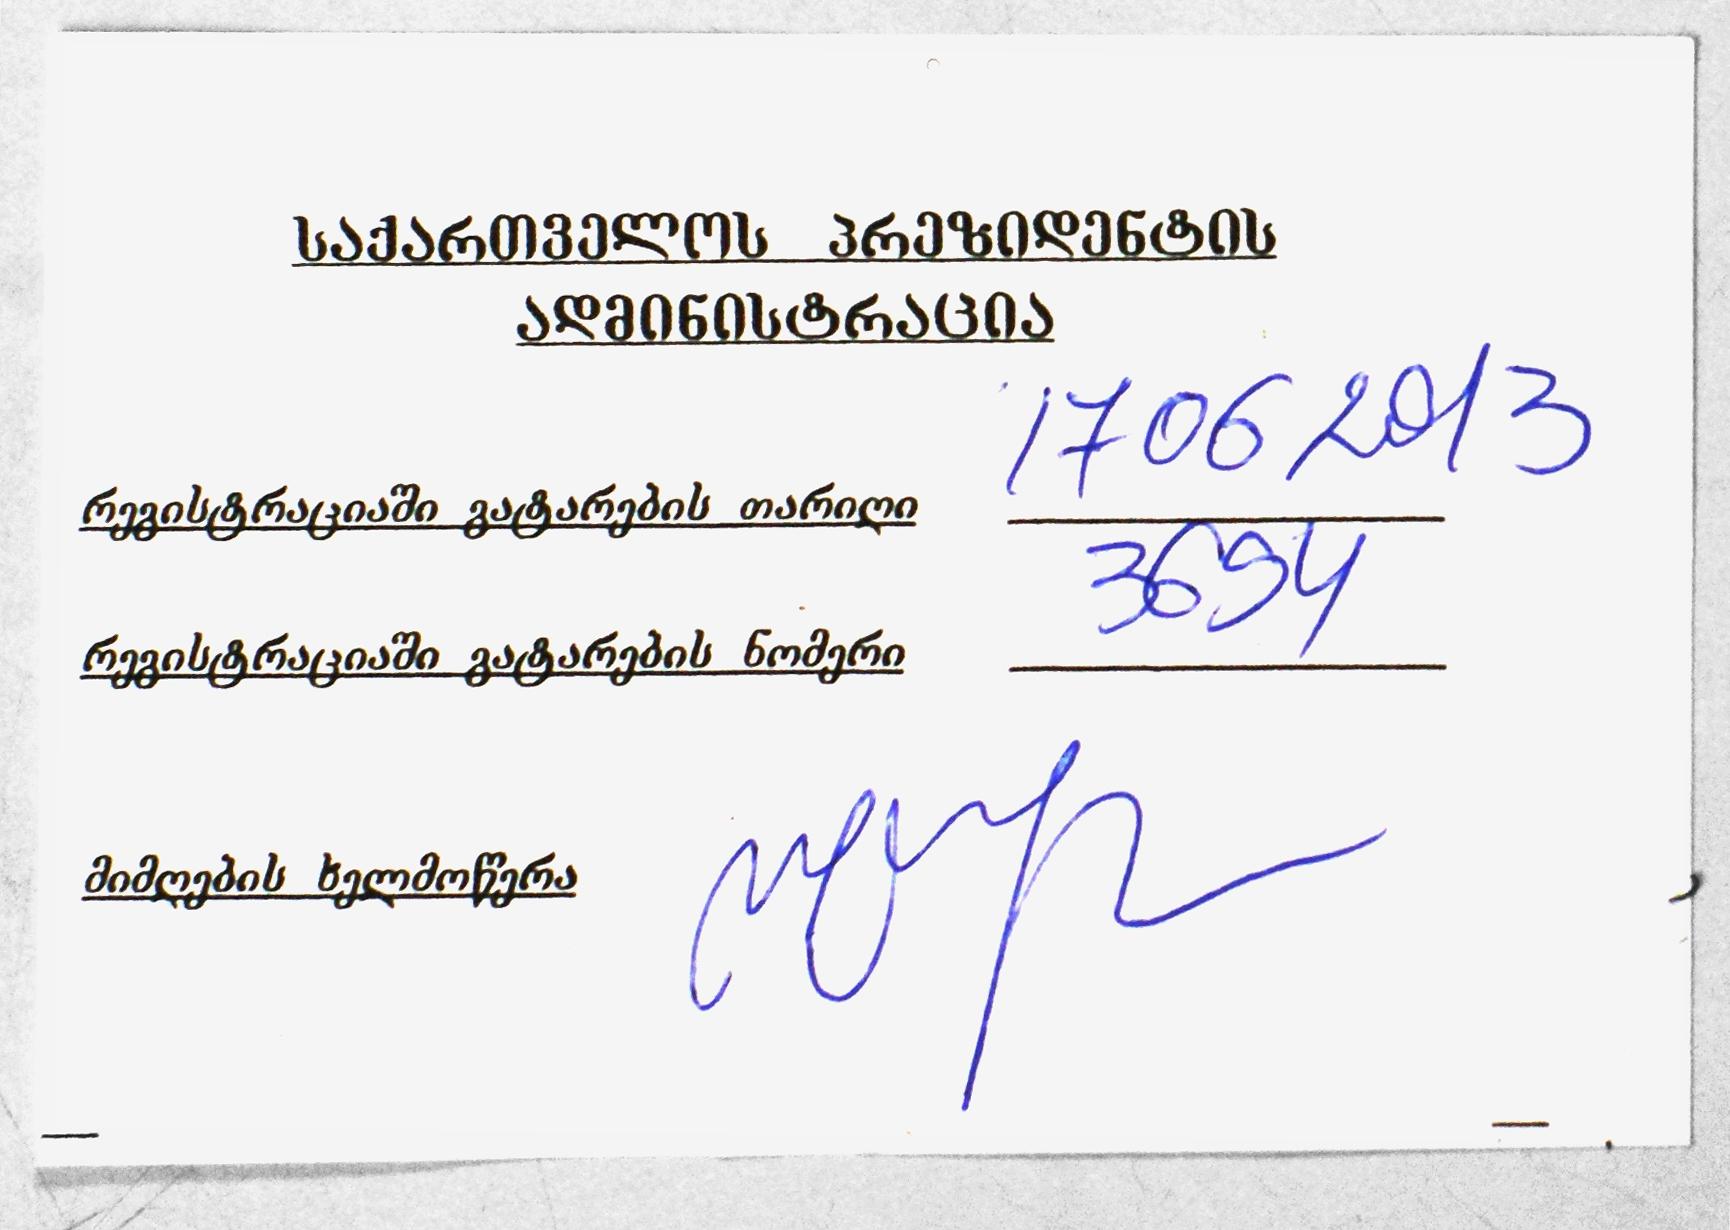 20130617_АП ПРЕЗИДЕНТА